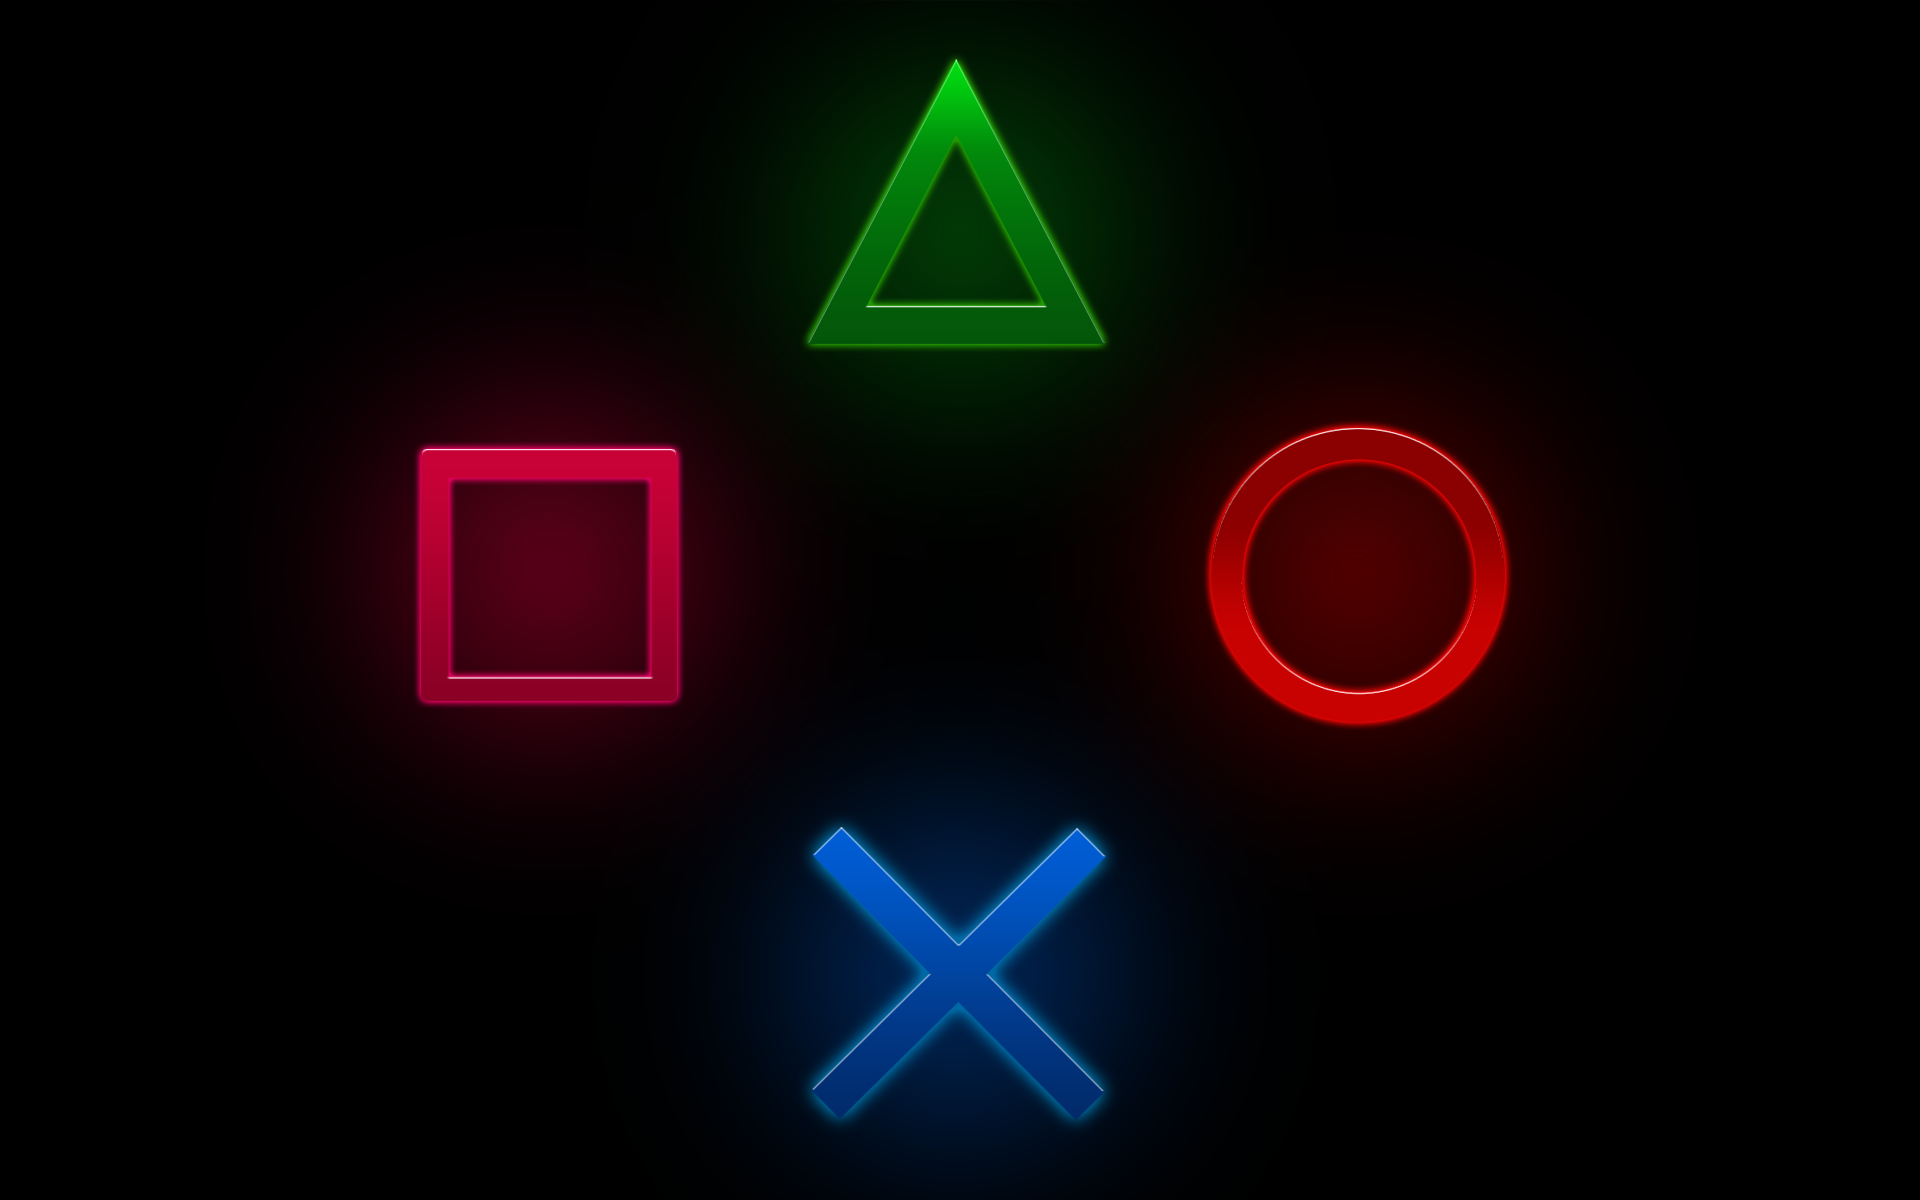 Playstation Buttons Wallpaper